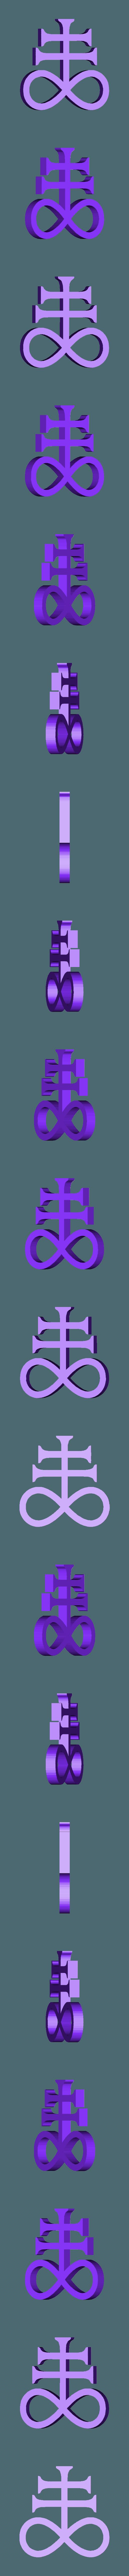 P_Rouge-Brimstone.stl Download free STL file Brimstone Keychain • 3D printer template, conceptify